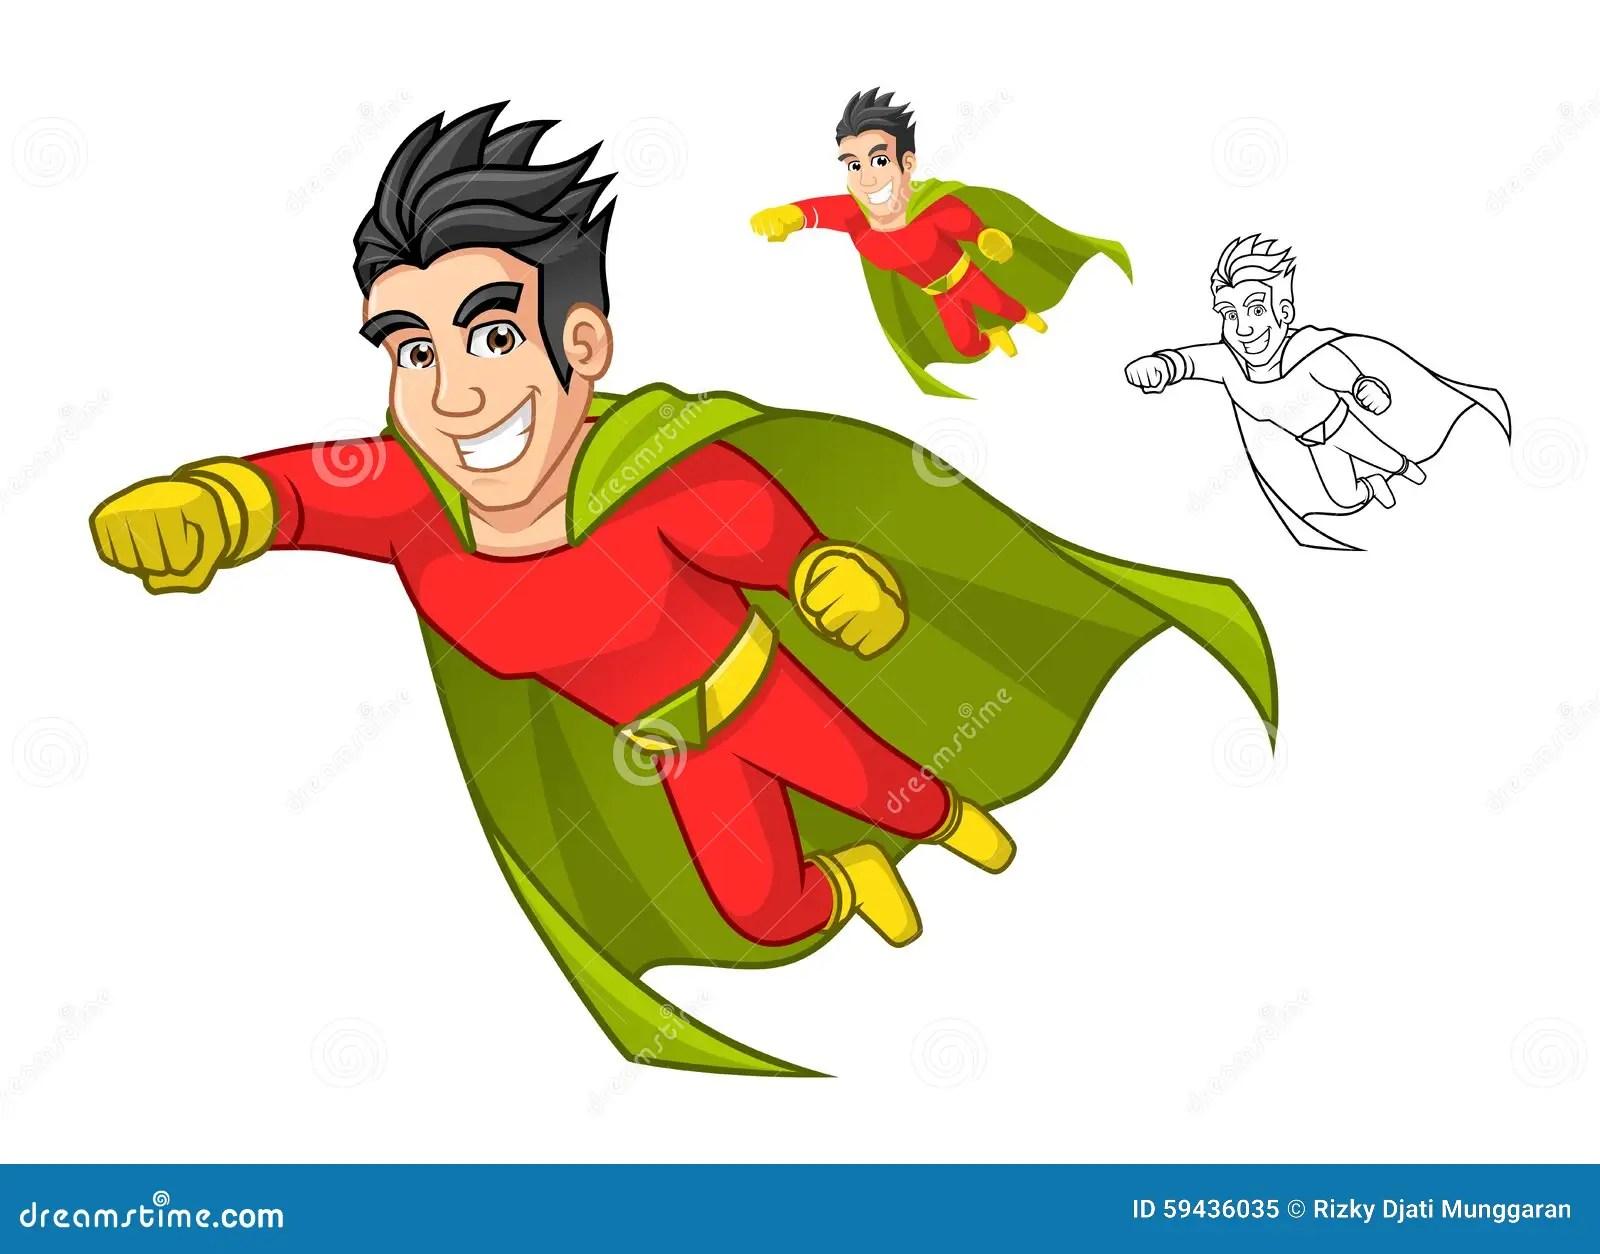 cool super hero cartoon